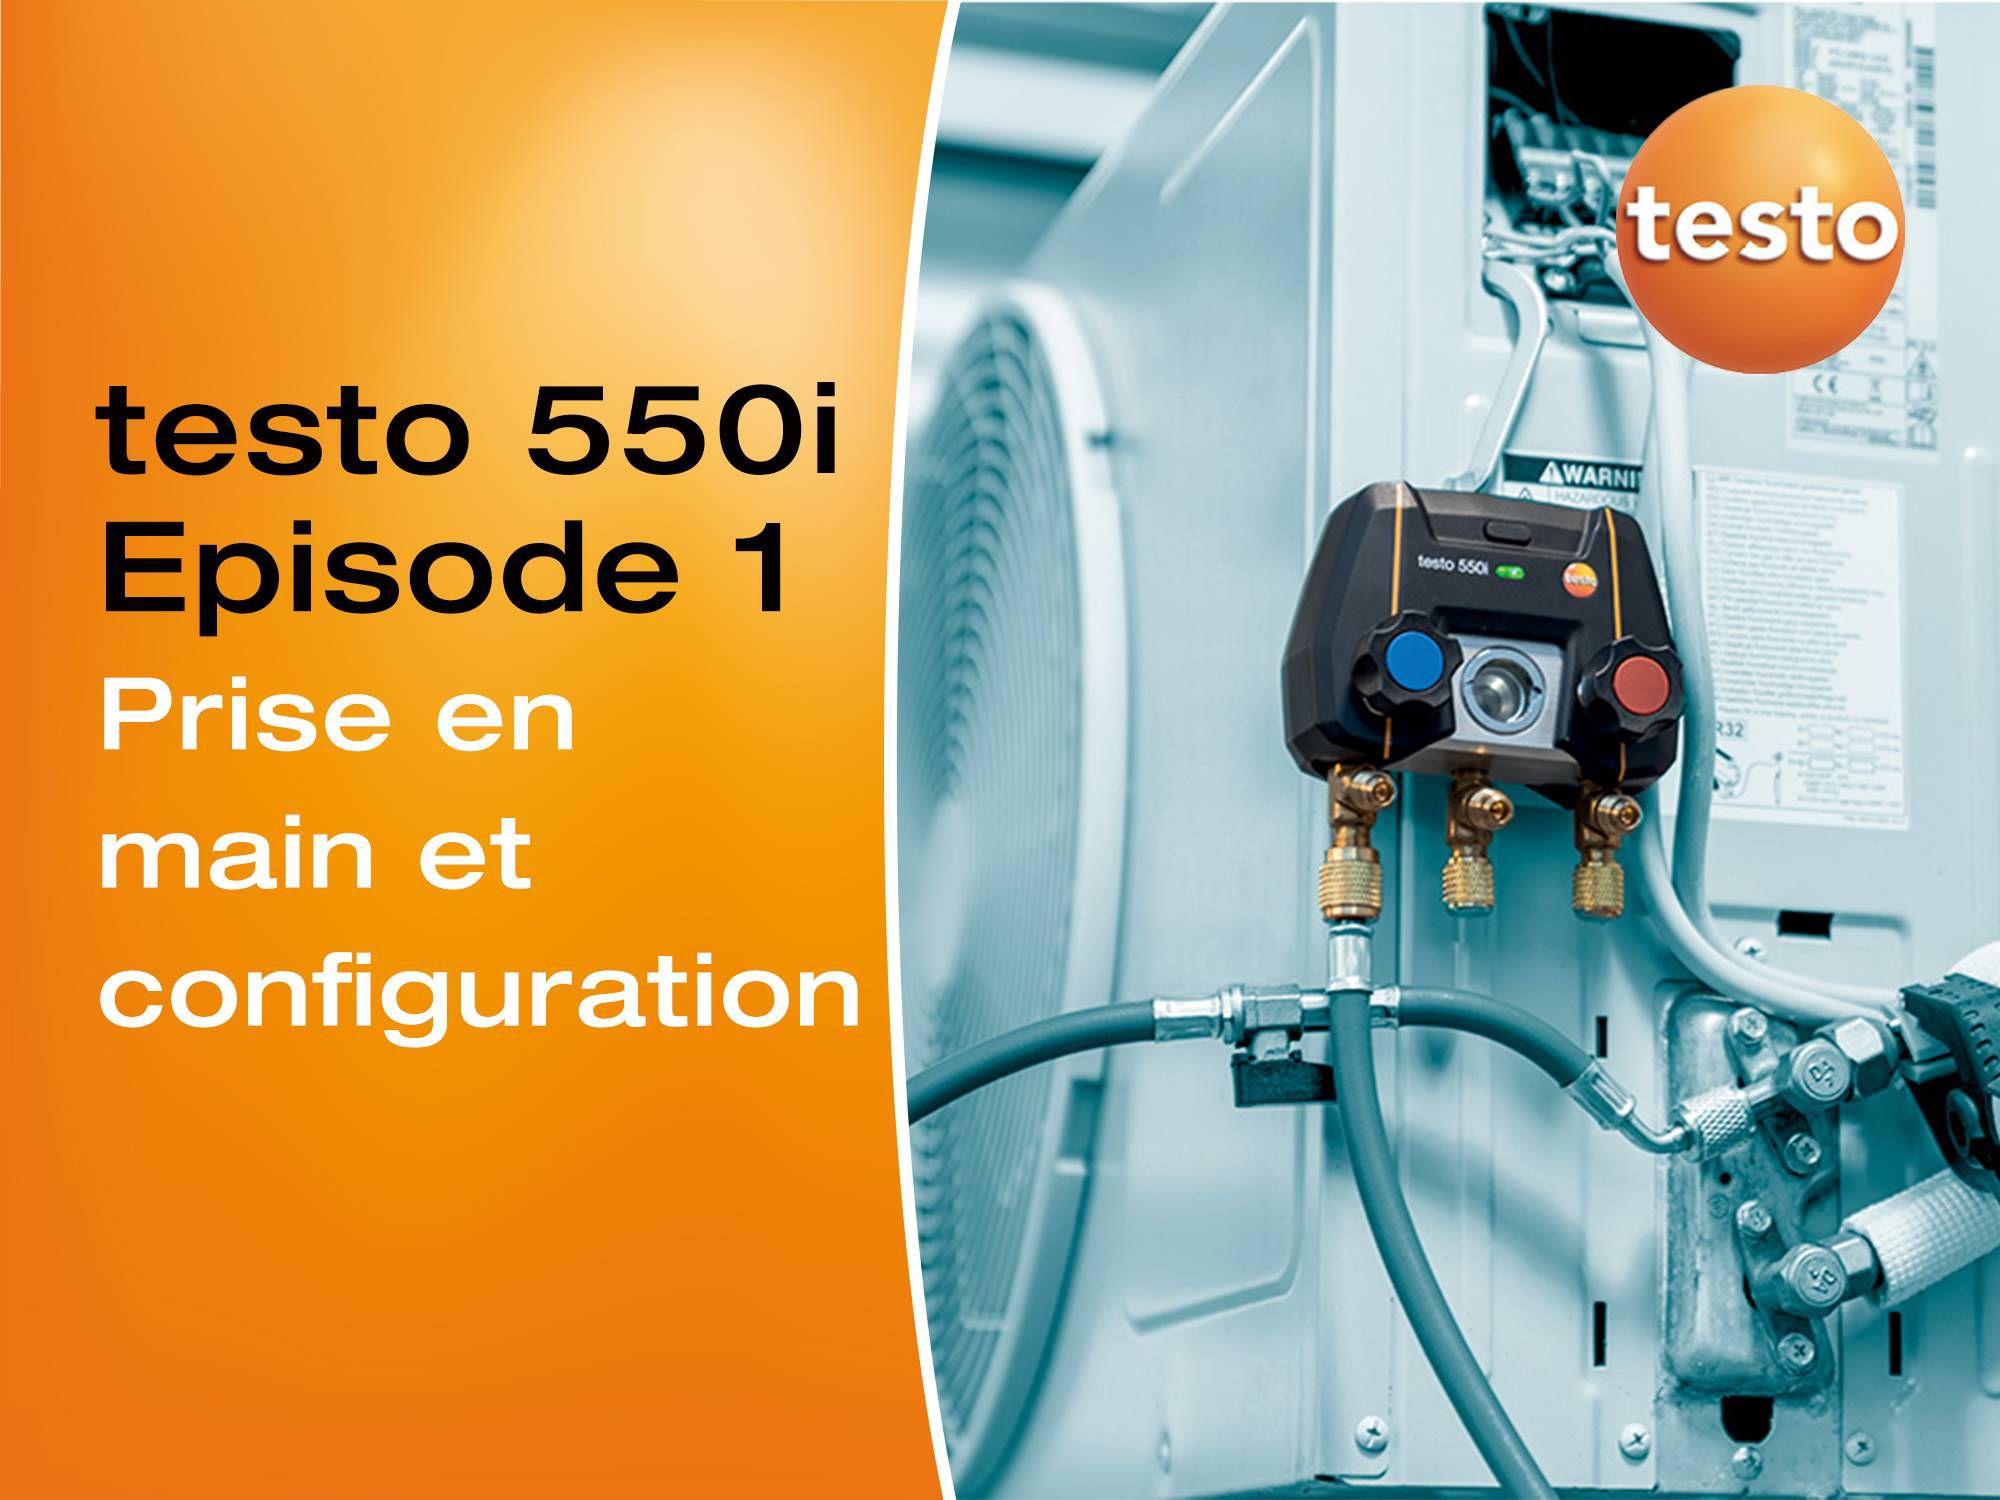 Tutoriel vidéo prise en main du manomètre compact testo 550i